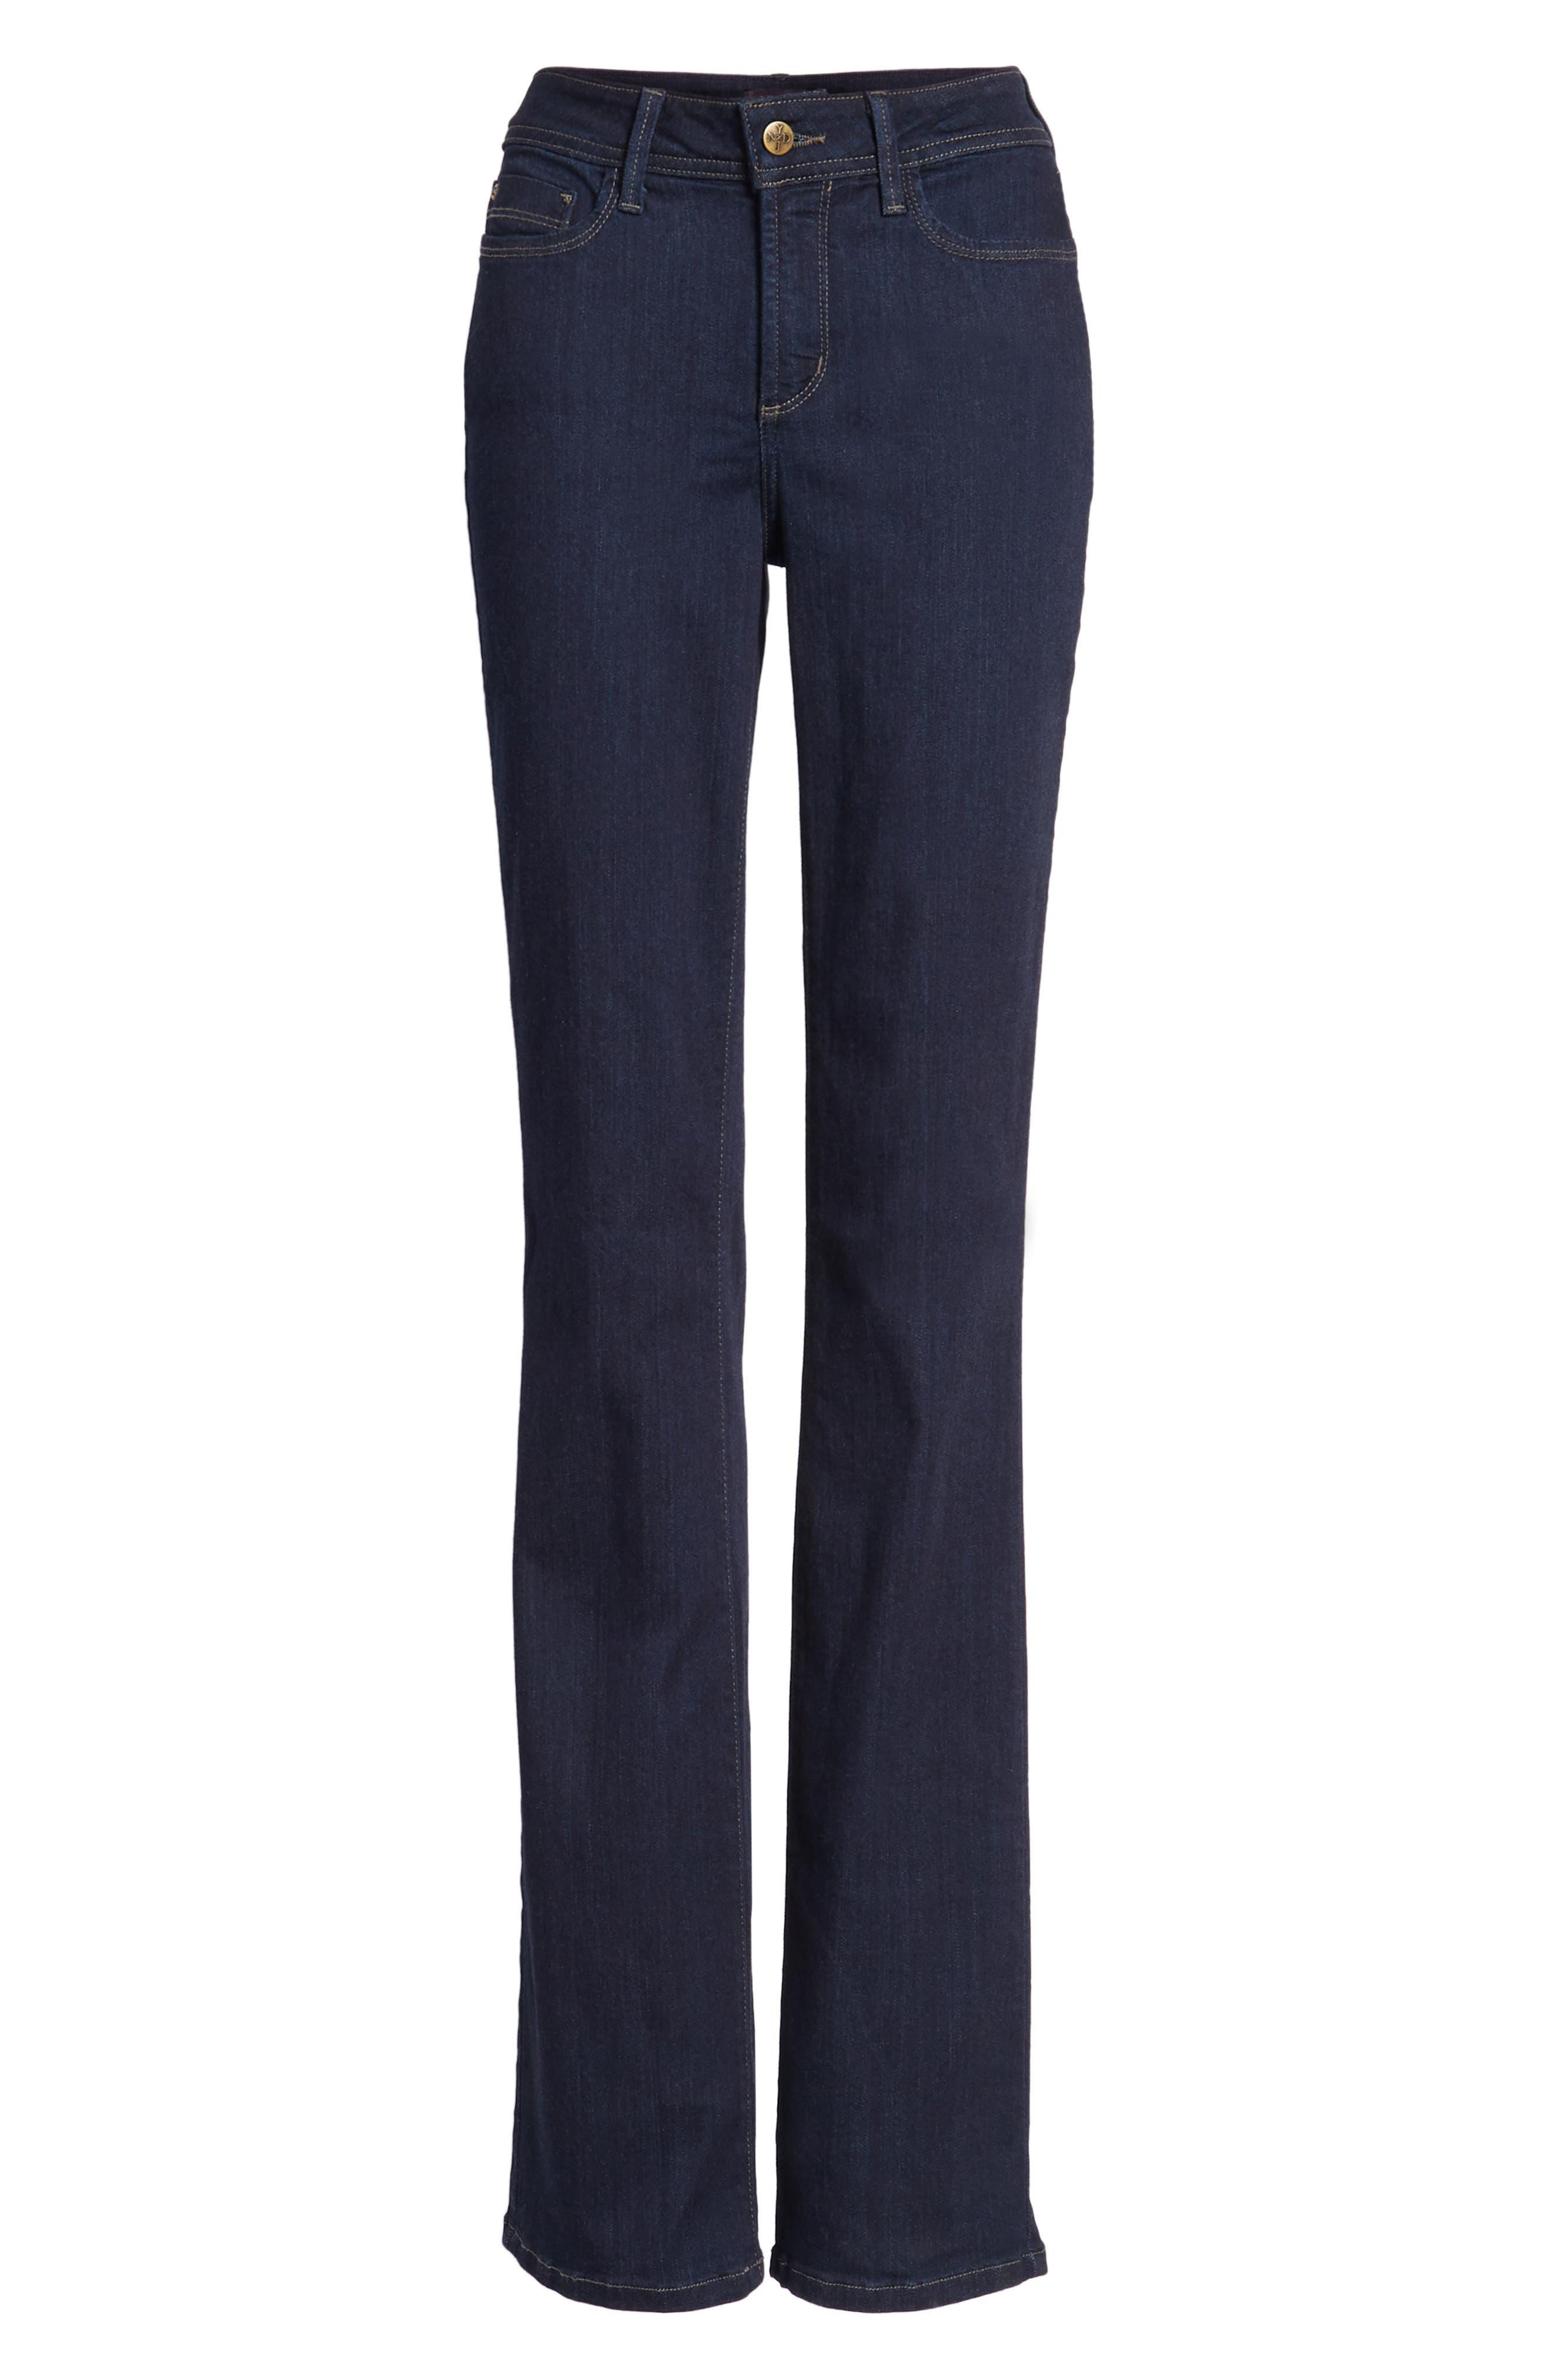 Billie Mini Bootcut Jeans,                             Alternate thumbnail 7, color,                             Mabel